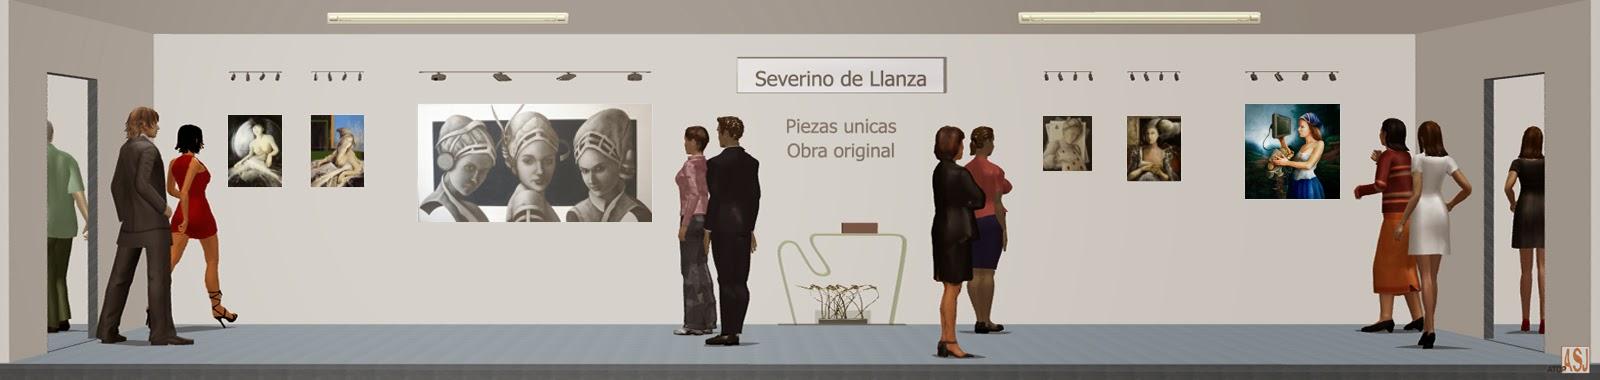 "<img src=""http://3.bp.blogspot.com/-J0tHTkTAl6M/U0k7H8fqNRI/AAAAAAAAXJI/q3pPYMZ48fY/s1600/sala_de_exposicion_de_severino_de_llanza.jpg"" alt="" Sala de exposición virtual de pinturas y retratos de Severino de Llanza""/>"